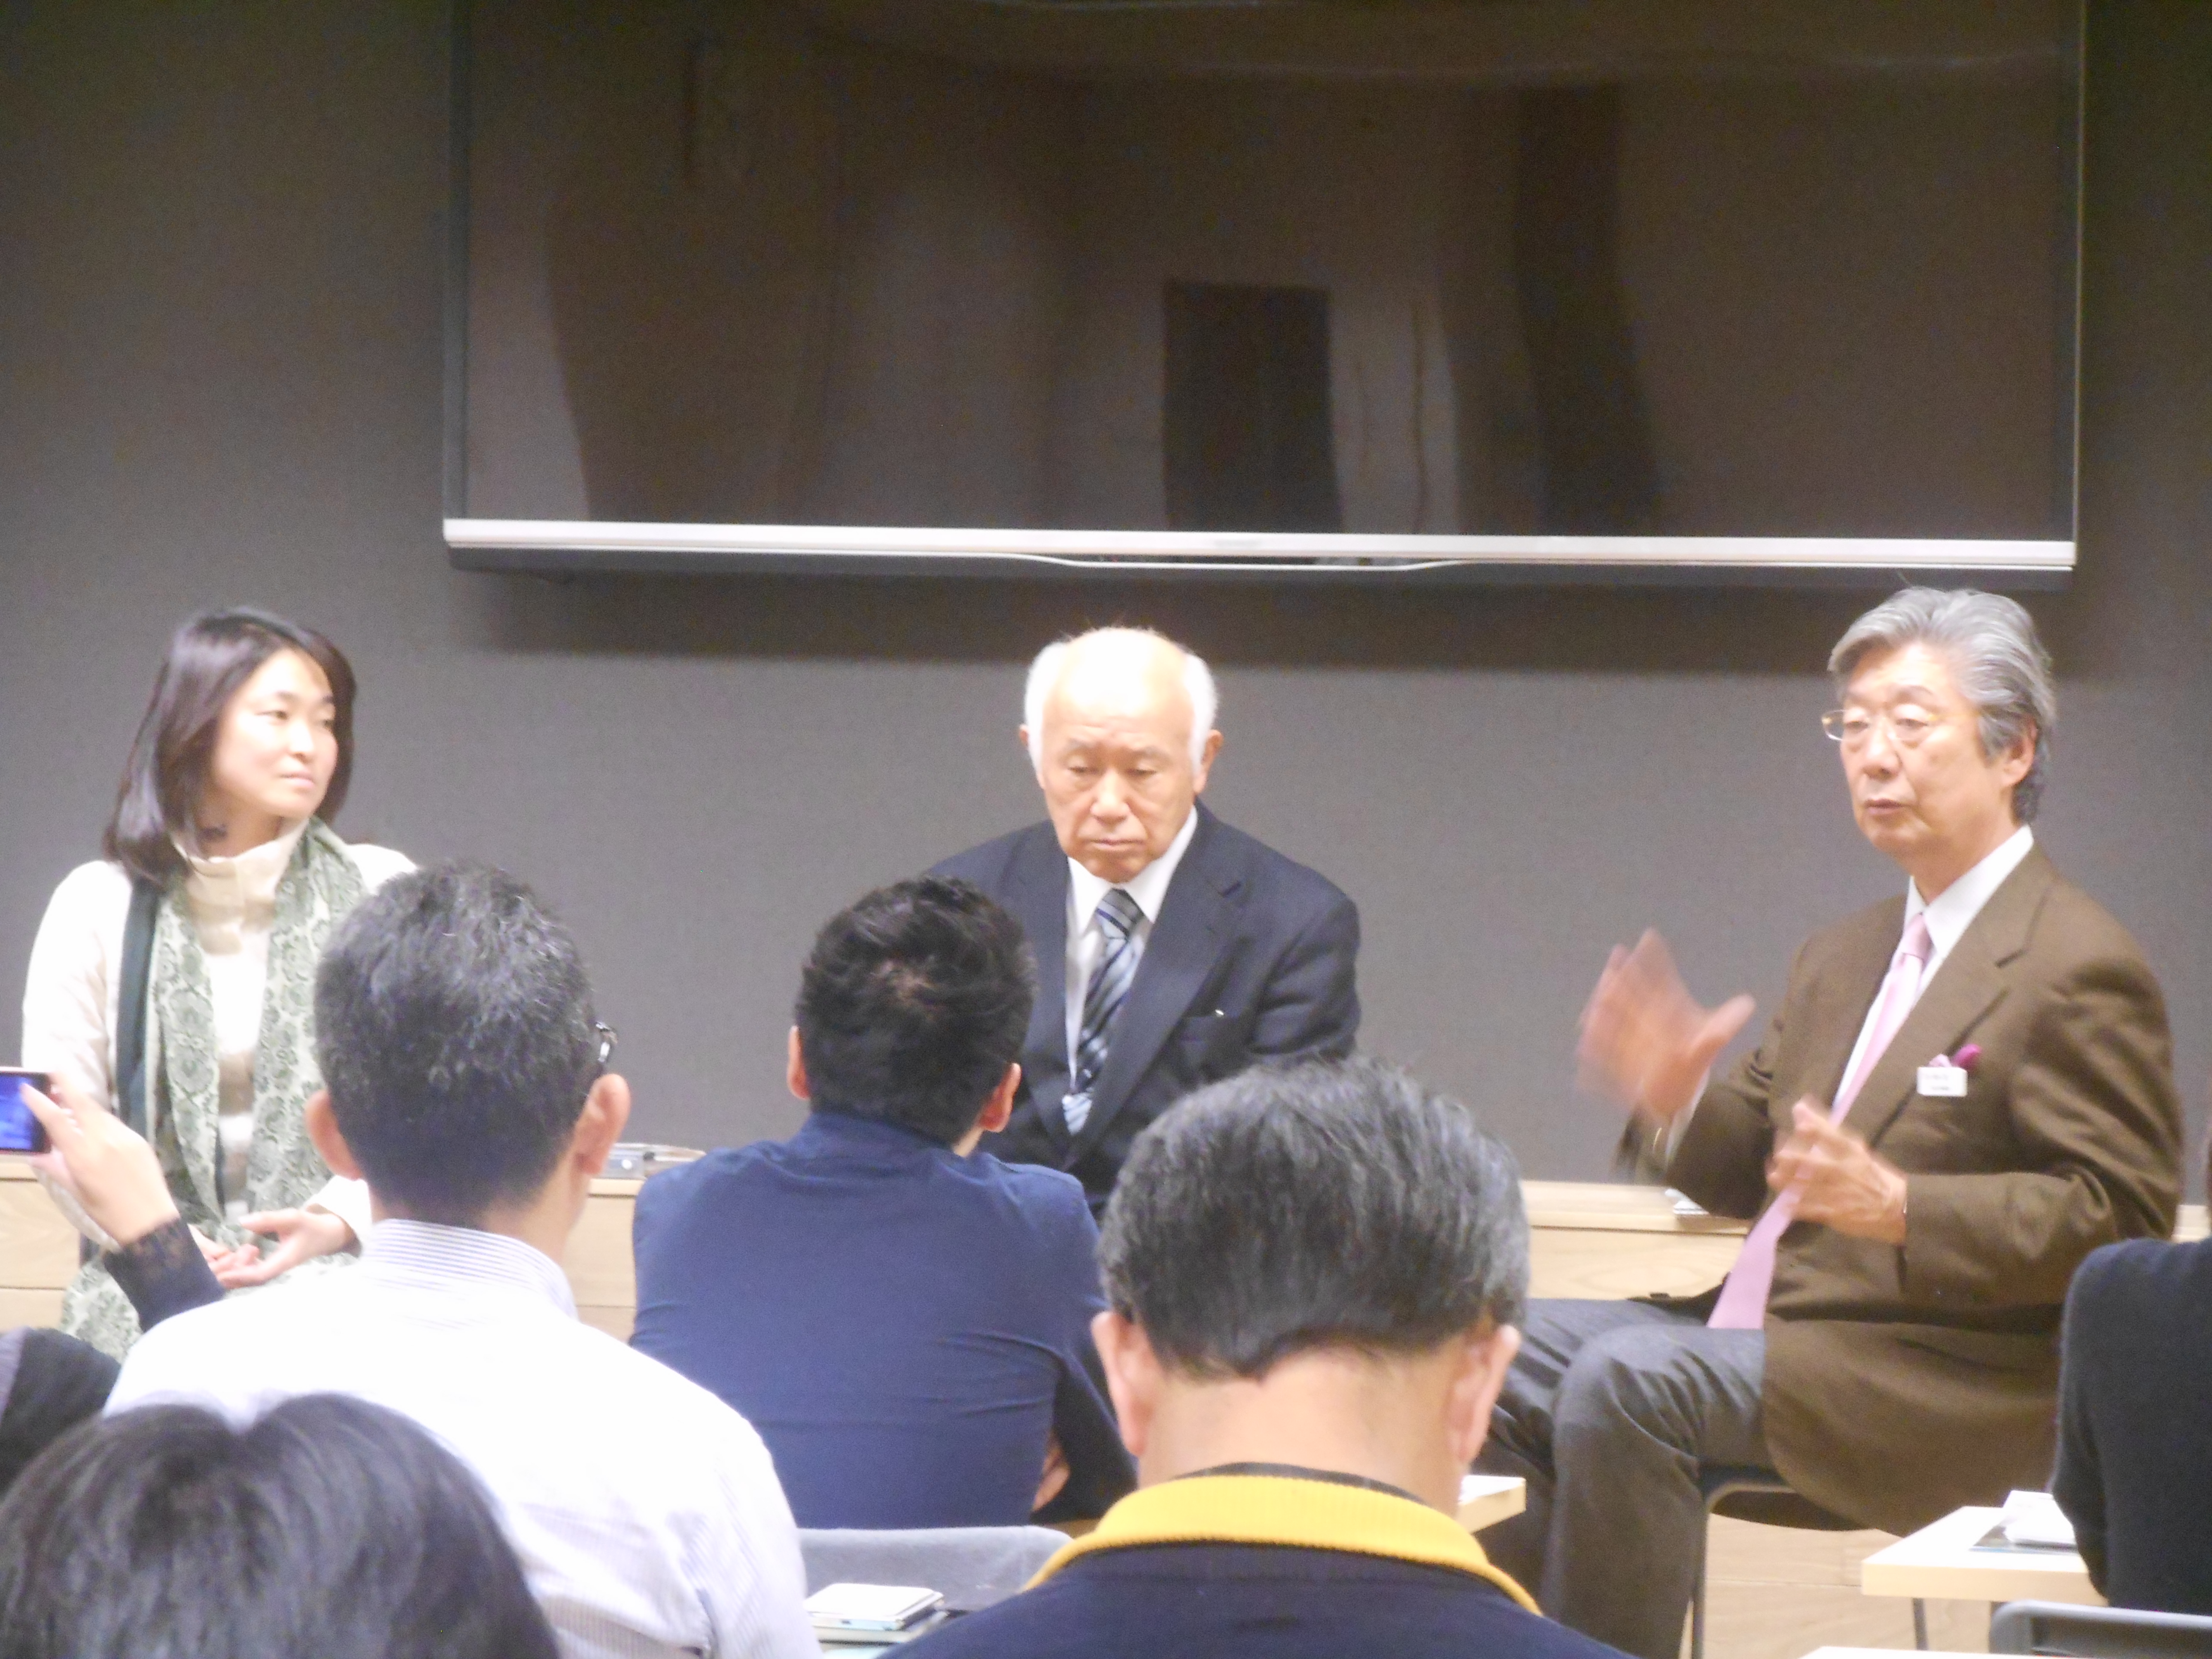 DSCN0468 - 2017年2月4日東京思風塾開催